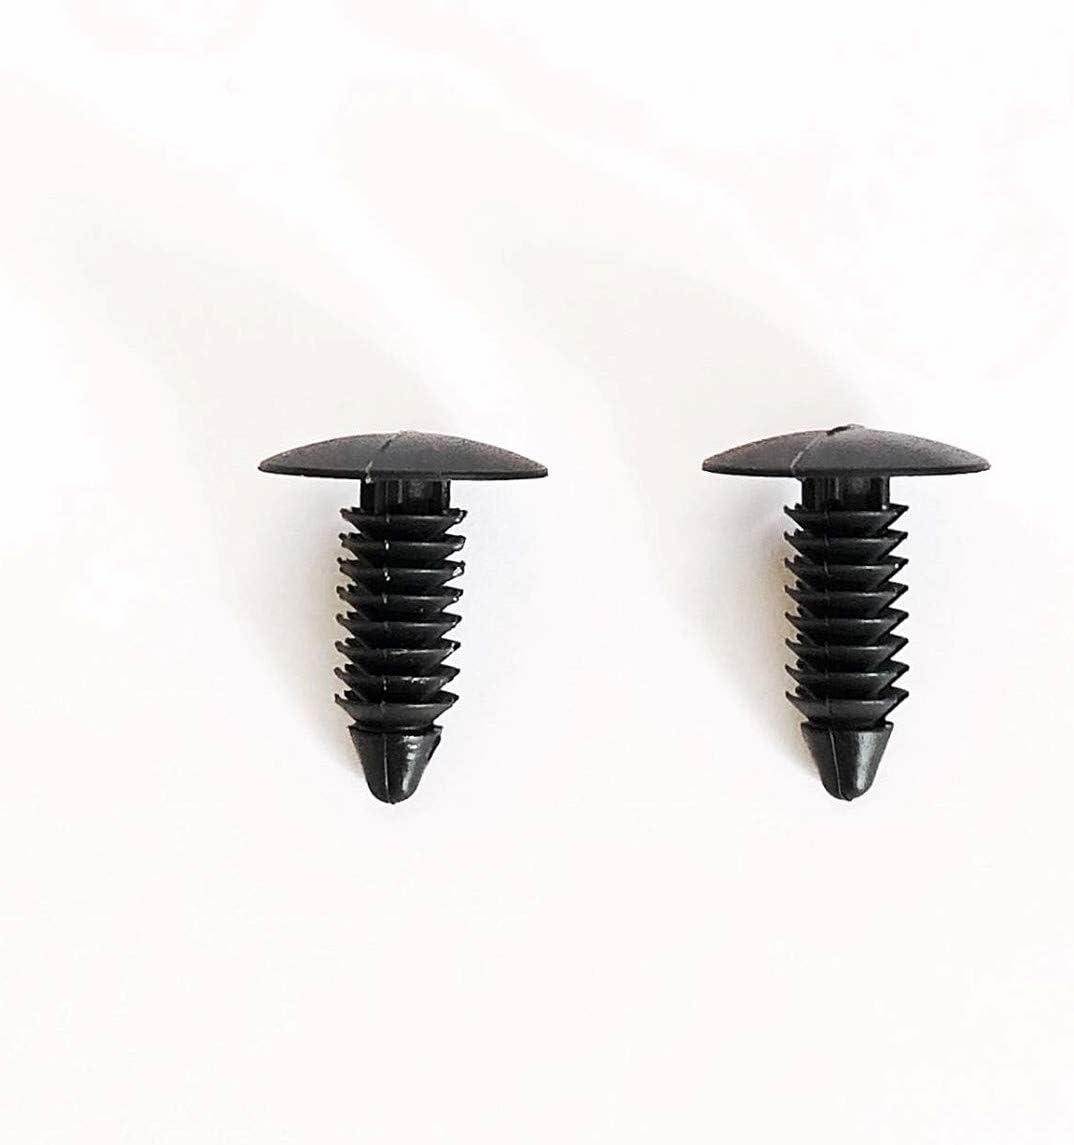 250 pcs Medium Multi-Gauge Rivet 3//16 or 7//32 Hole Patio Strapping Fasteners Webbing Lawn Chair Lounge Black